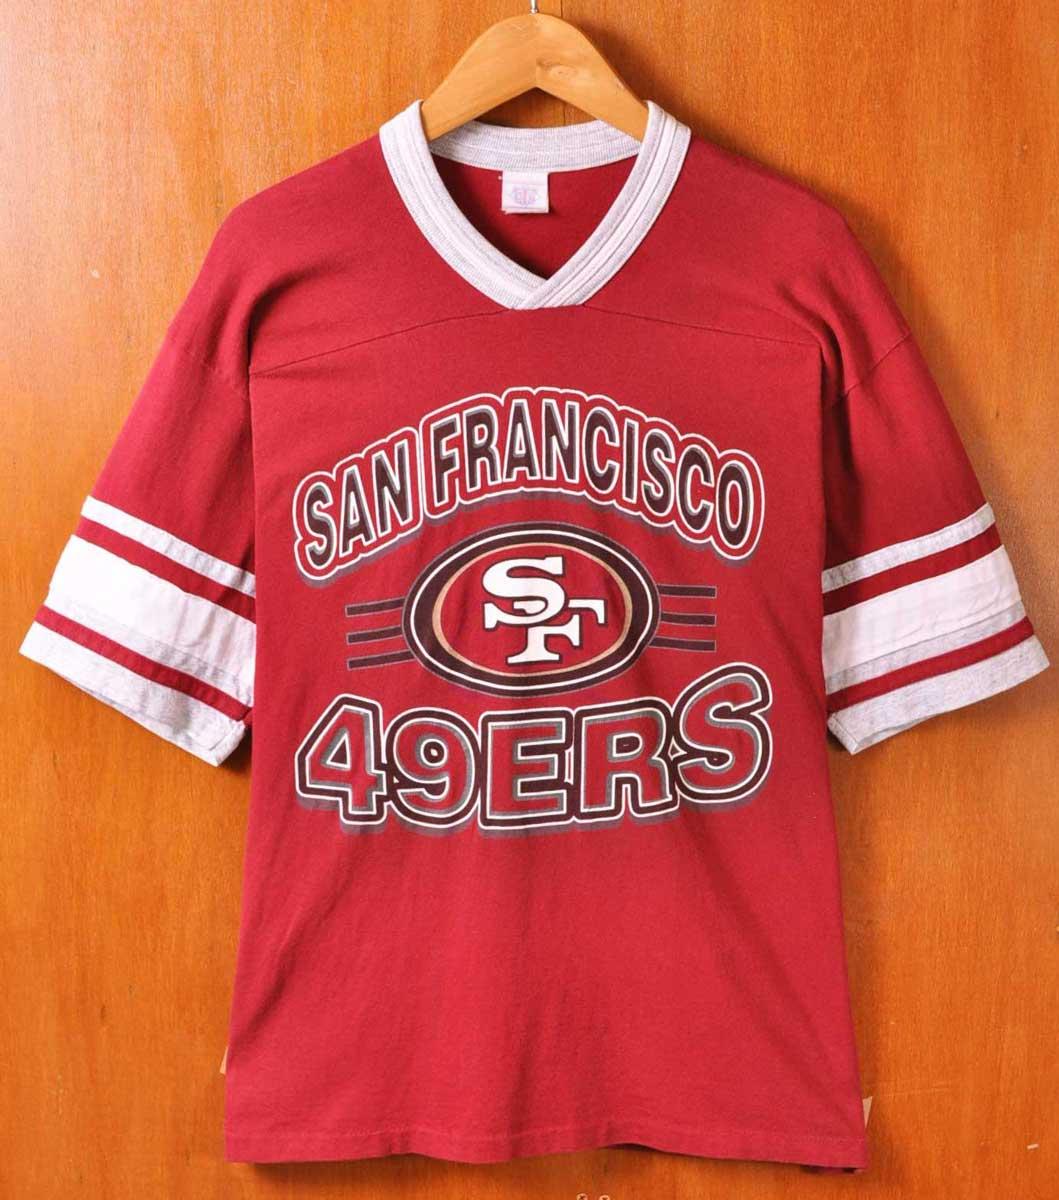 premium selection 92b50 db7c0 San Francisco 49ers T Shirts Cheap | Azərbaycan Dillər ...